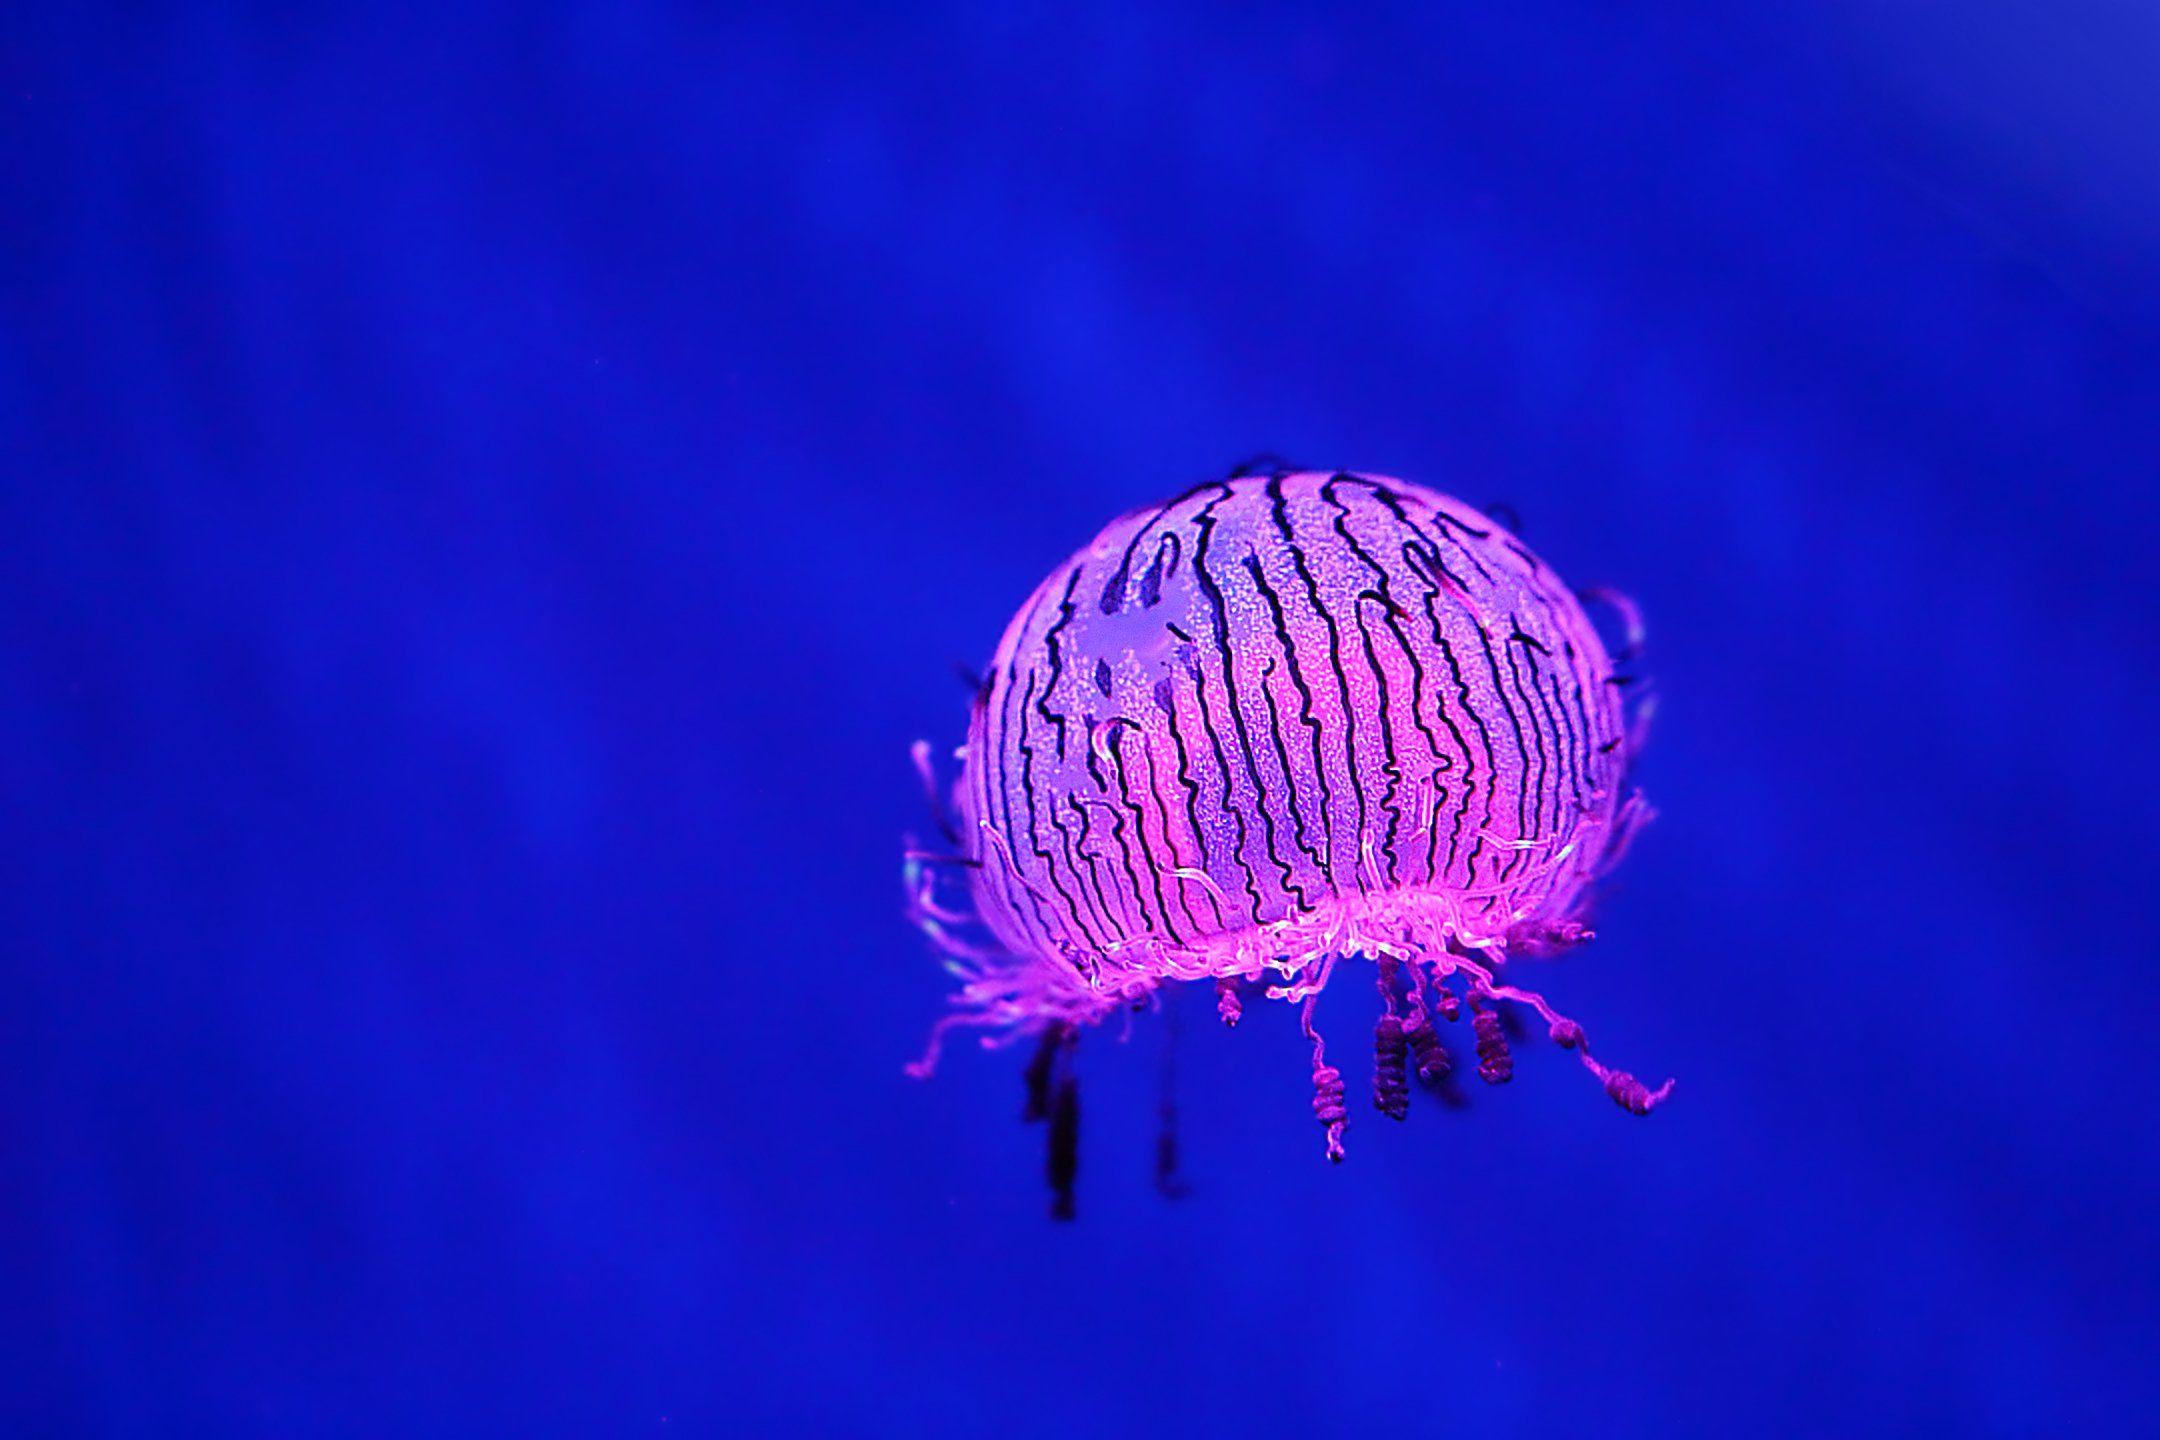 лимномедуза, медузы, гидроидные, стрекающие, underwater, jellyfish, olindiasidae, olindioides, hydrozoa, cnidaria, Салтыков Дмитрий